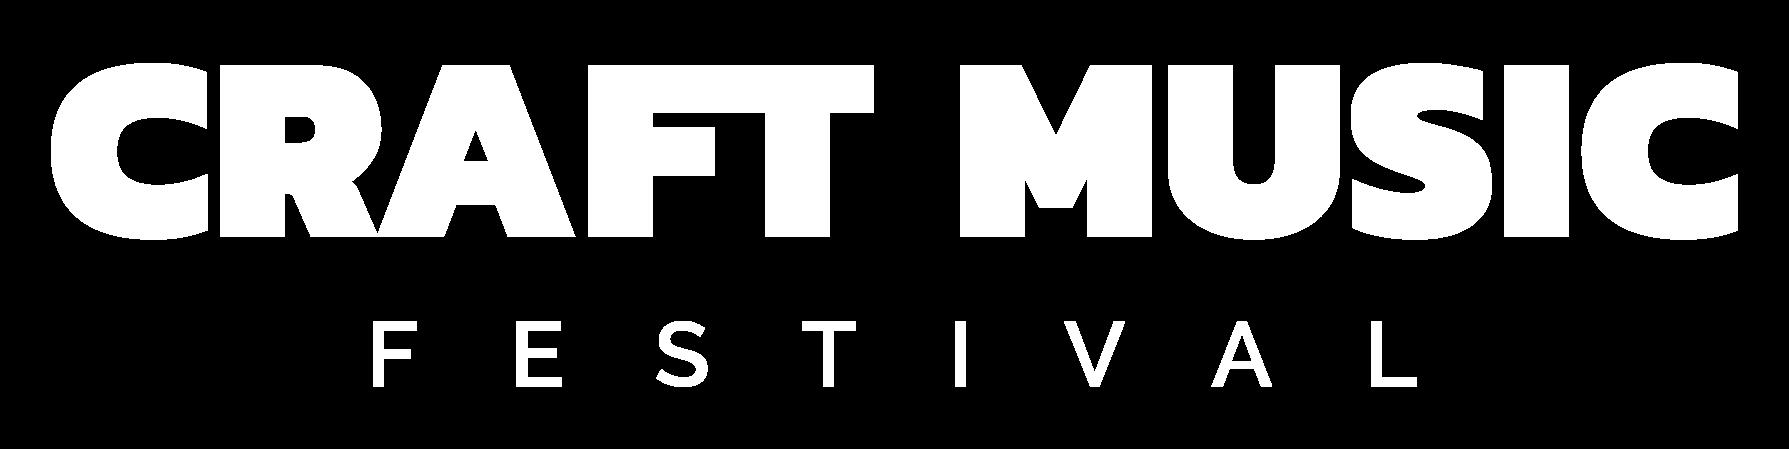 craftmusicfestival.pl